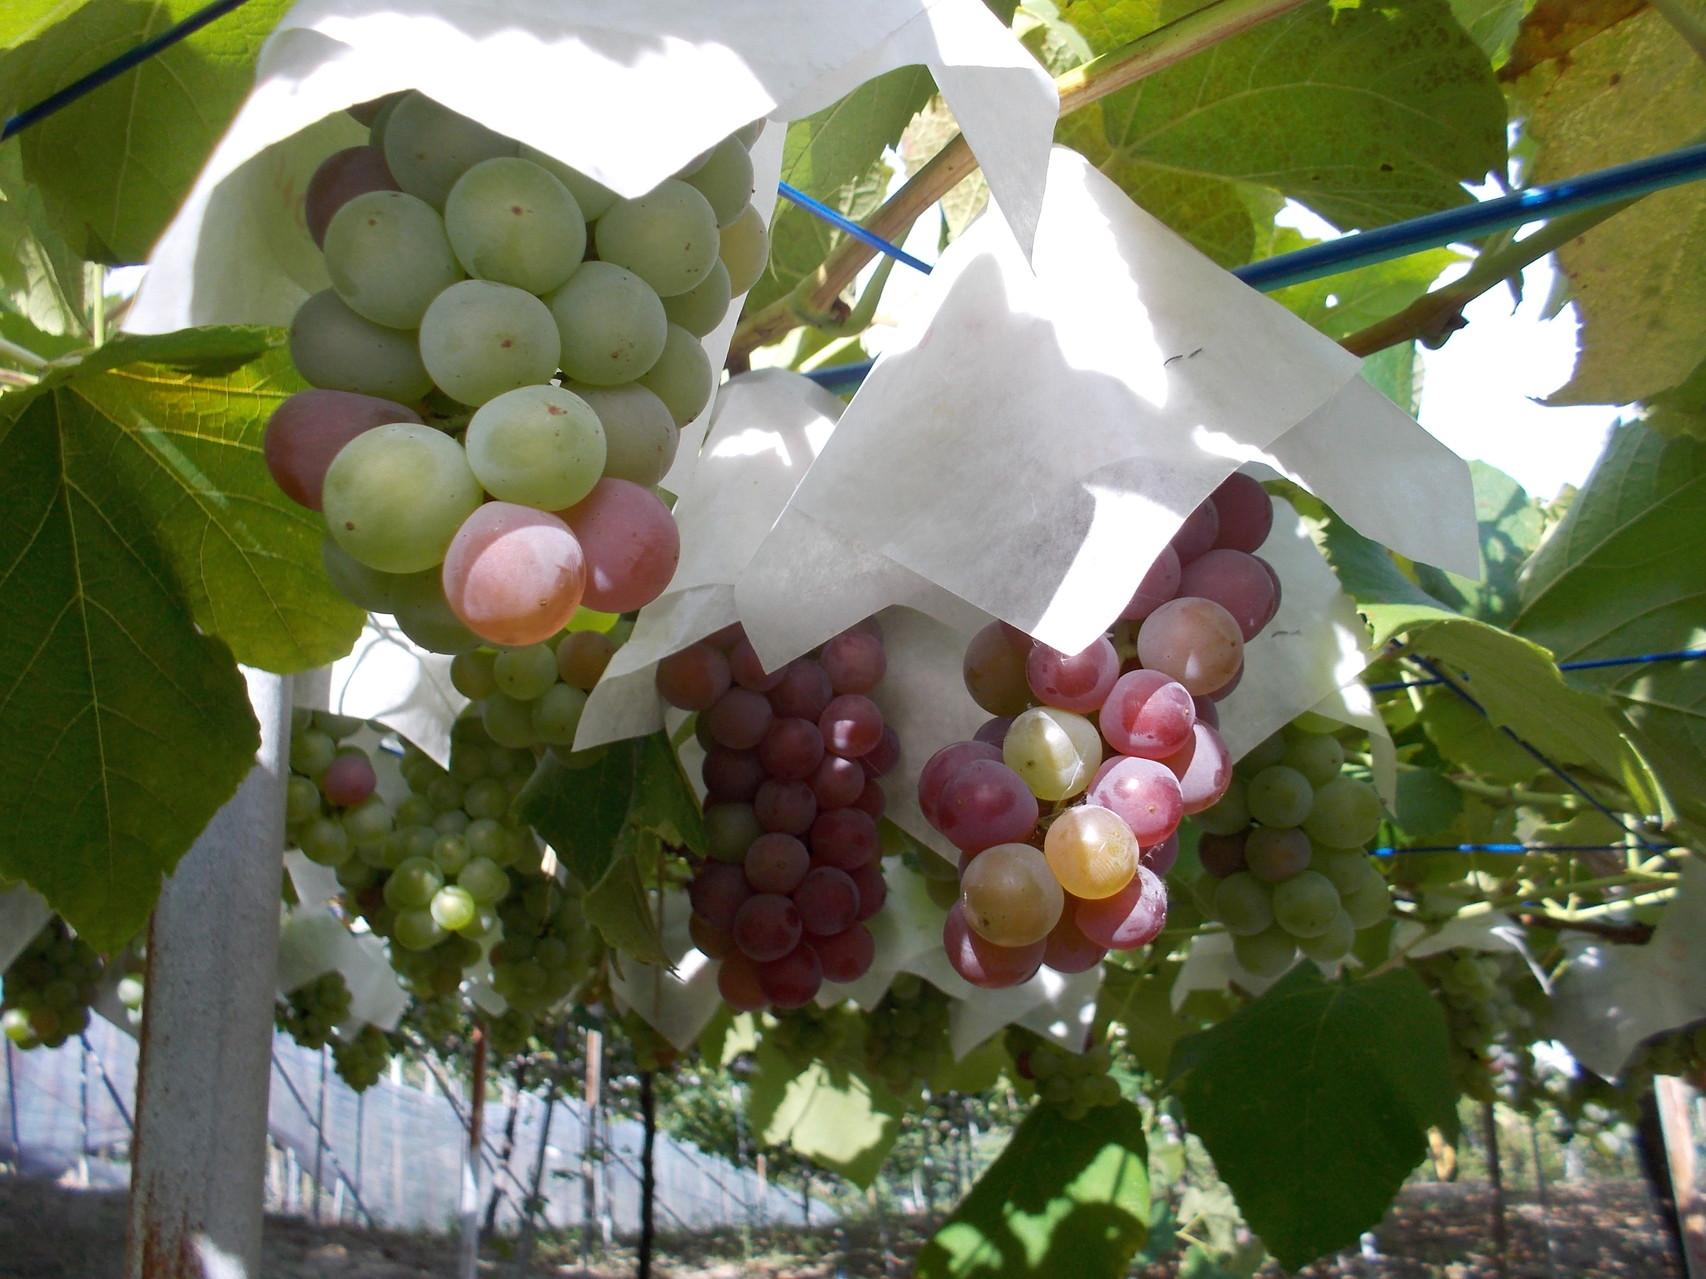 Late Jul あと2週間ほどで収穫です。